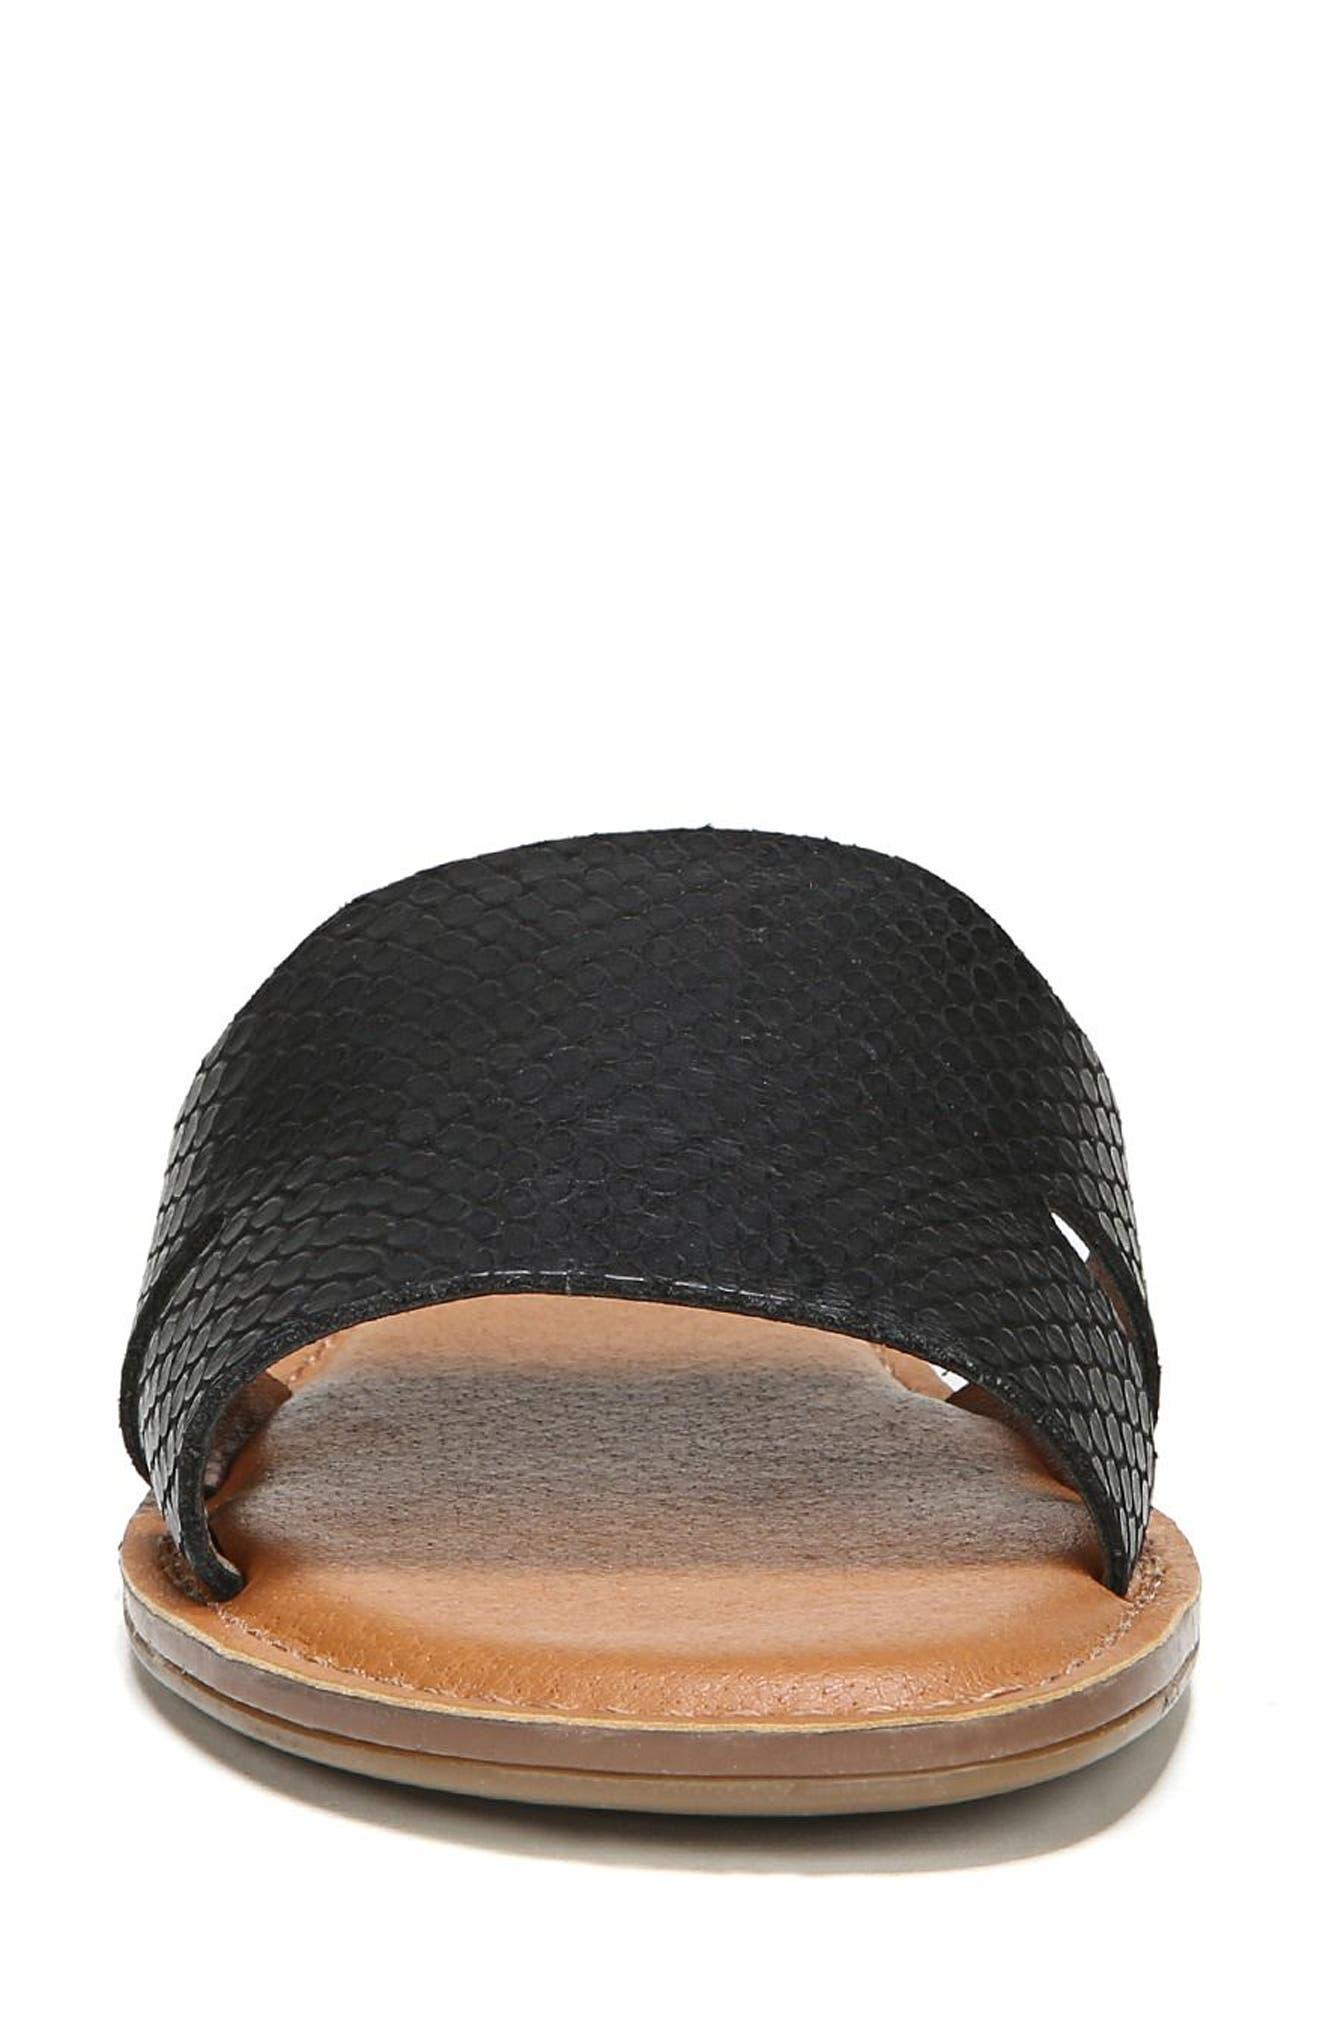 Ginelle Slide Sandal,                             Alternate thumbnail 4, color,                             BLACK PRINTED LEATHER